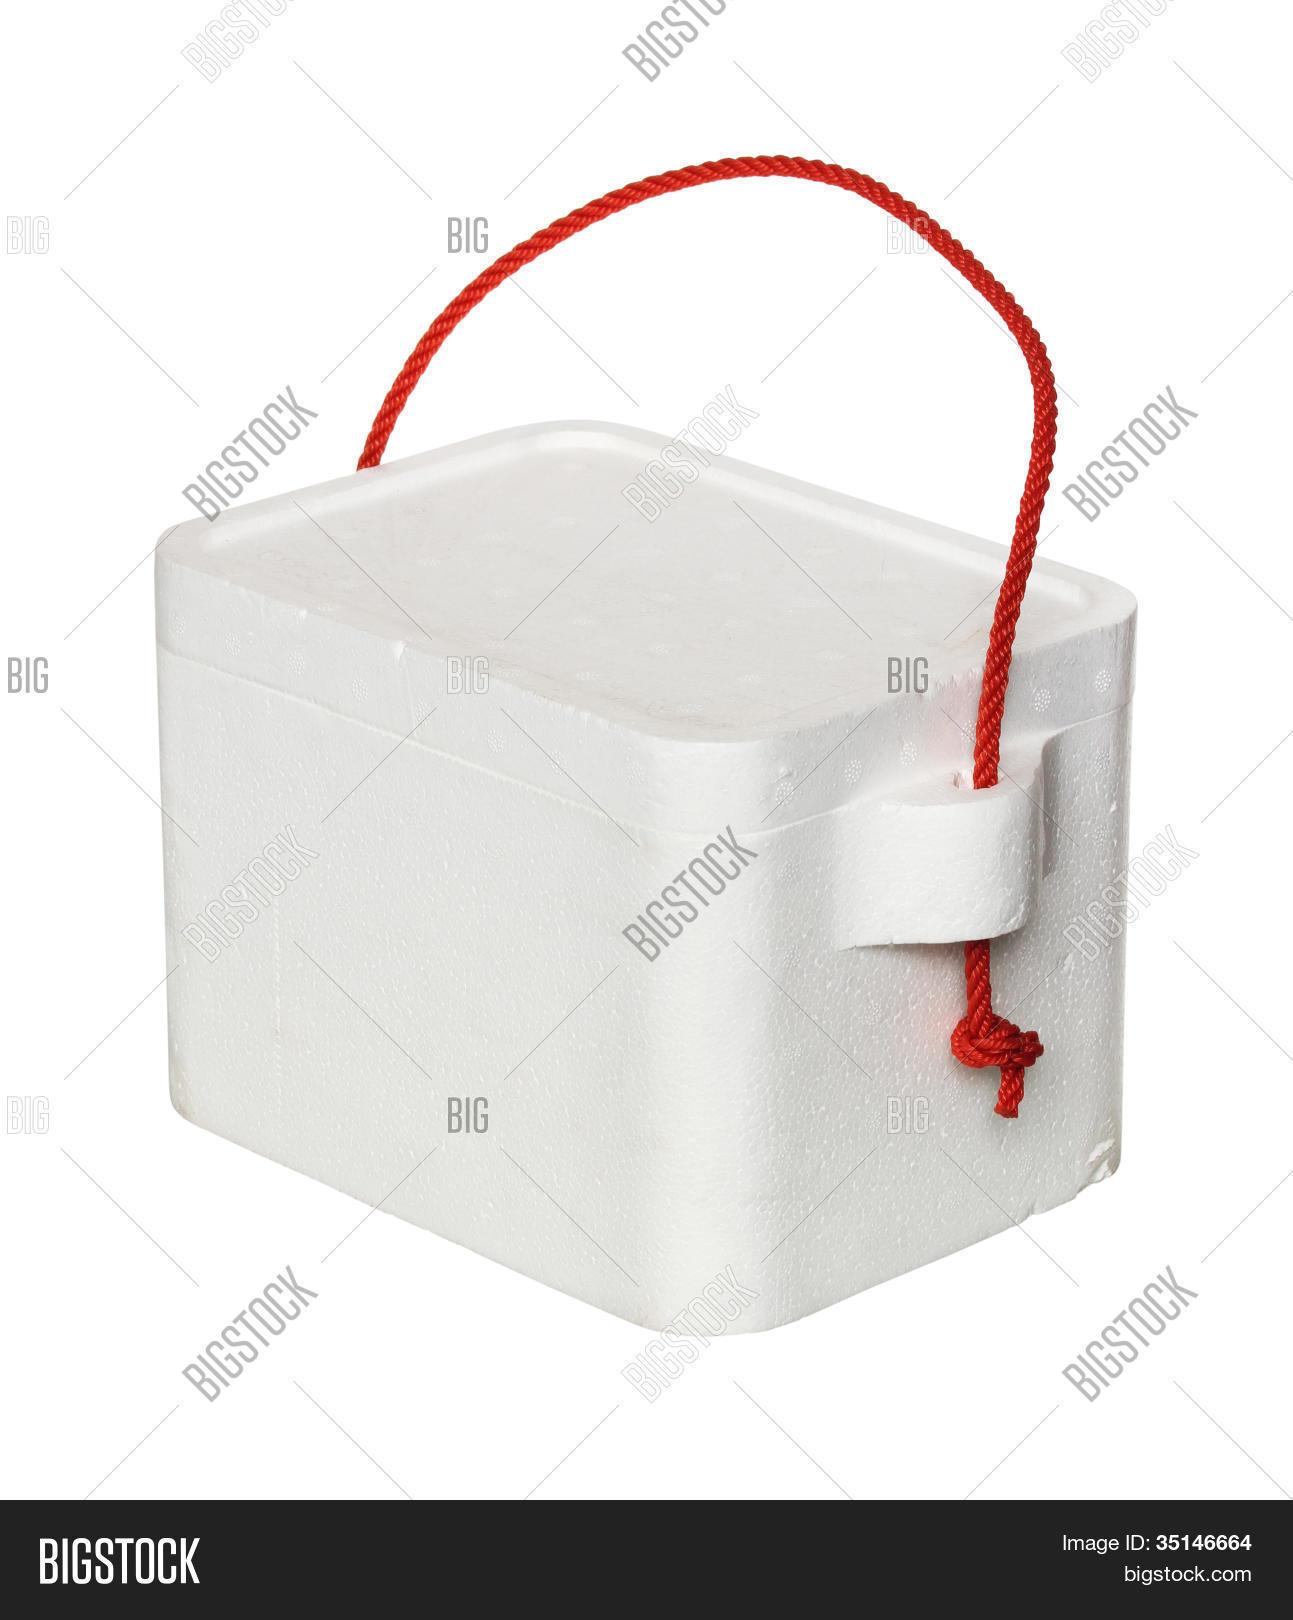 Large Styrofoam Coolers ~ Styrofoam cooler box image photo bigstock